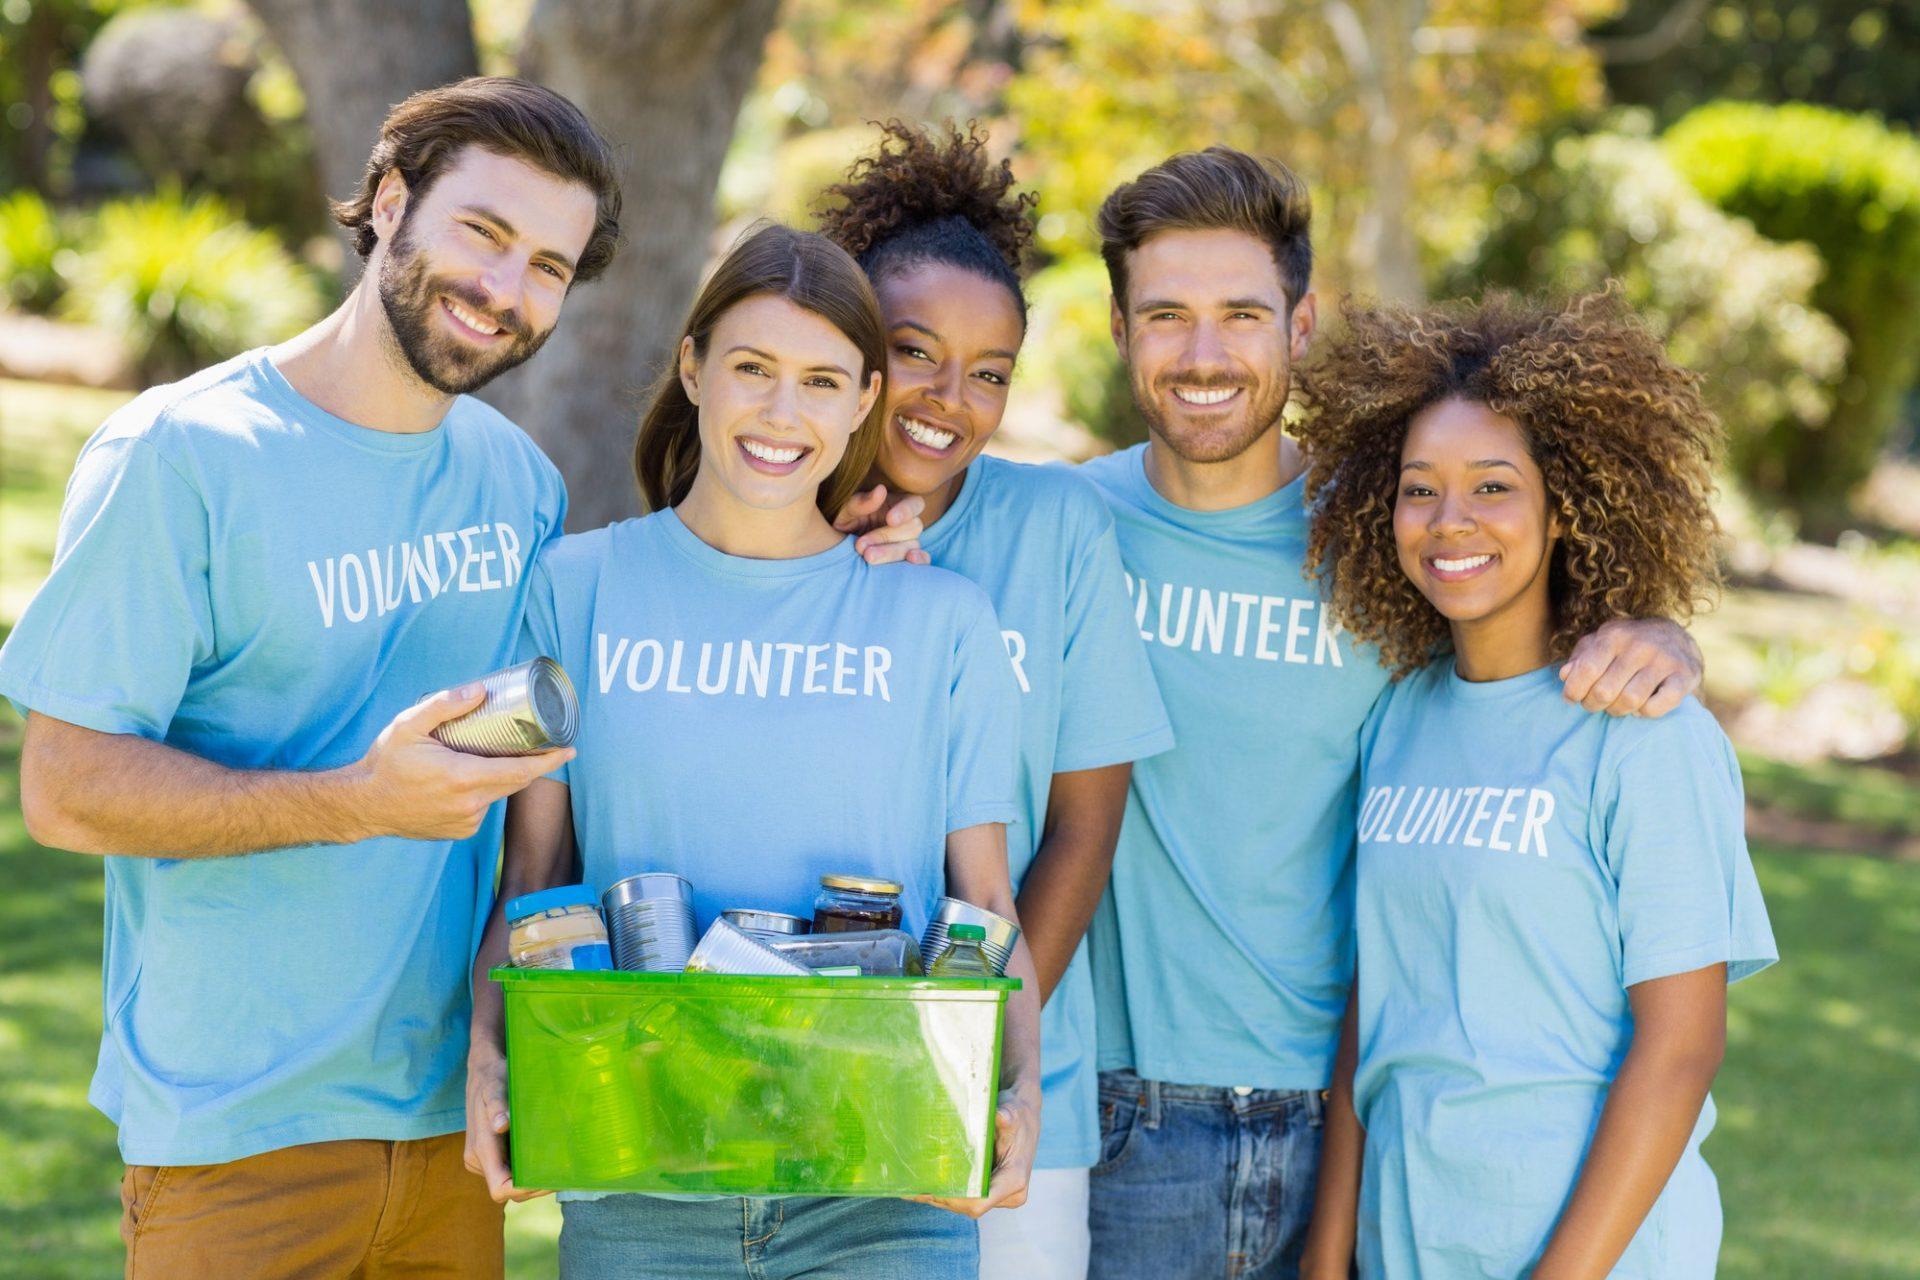 Portrait of volunteer group holding box